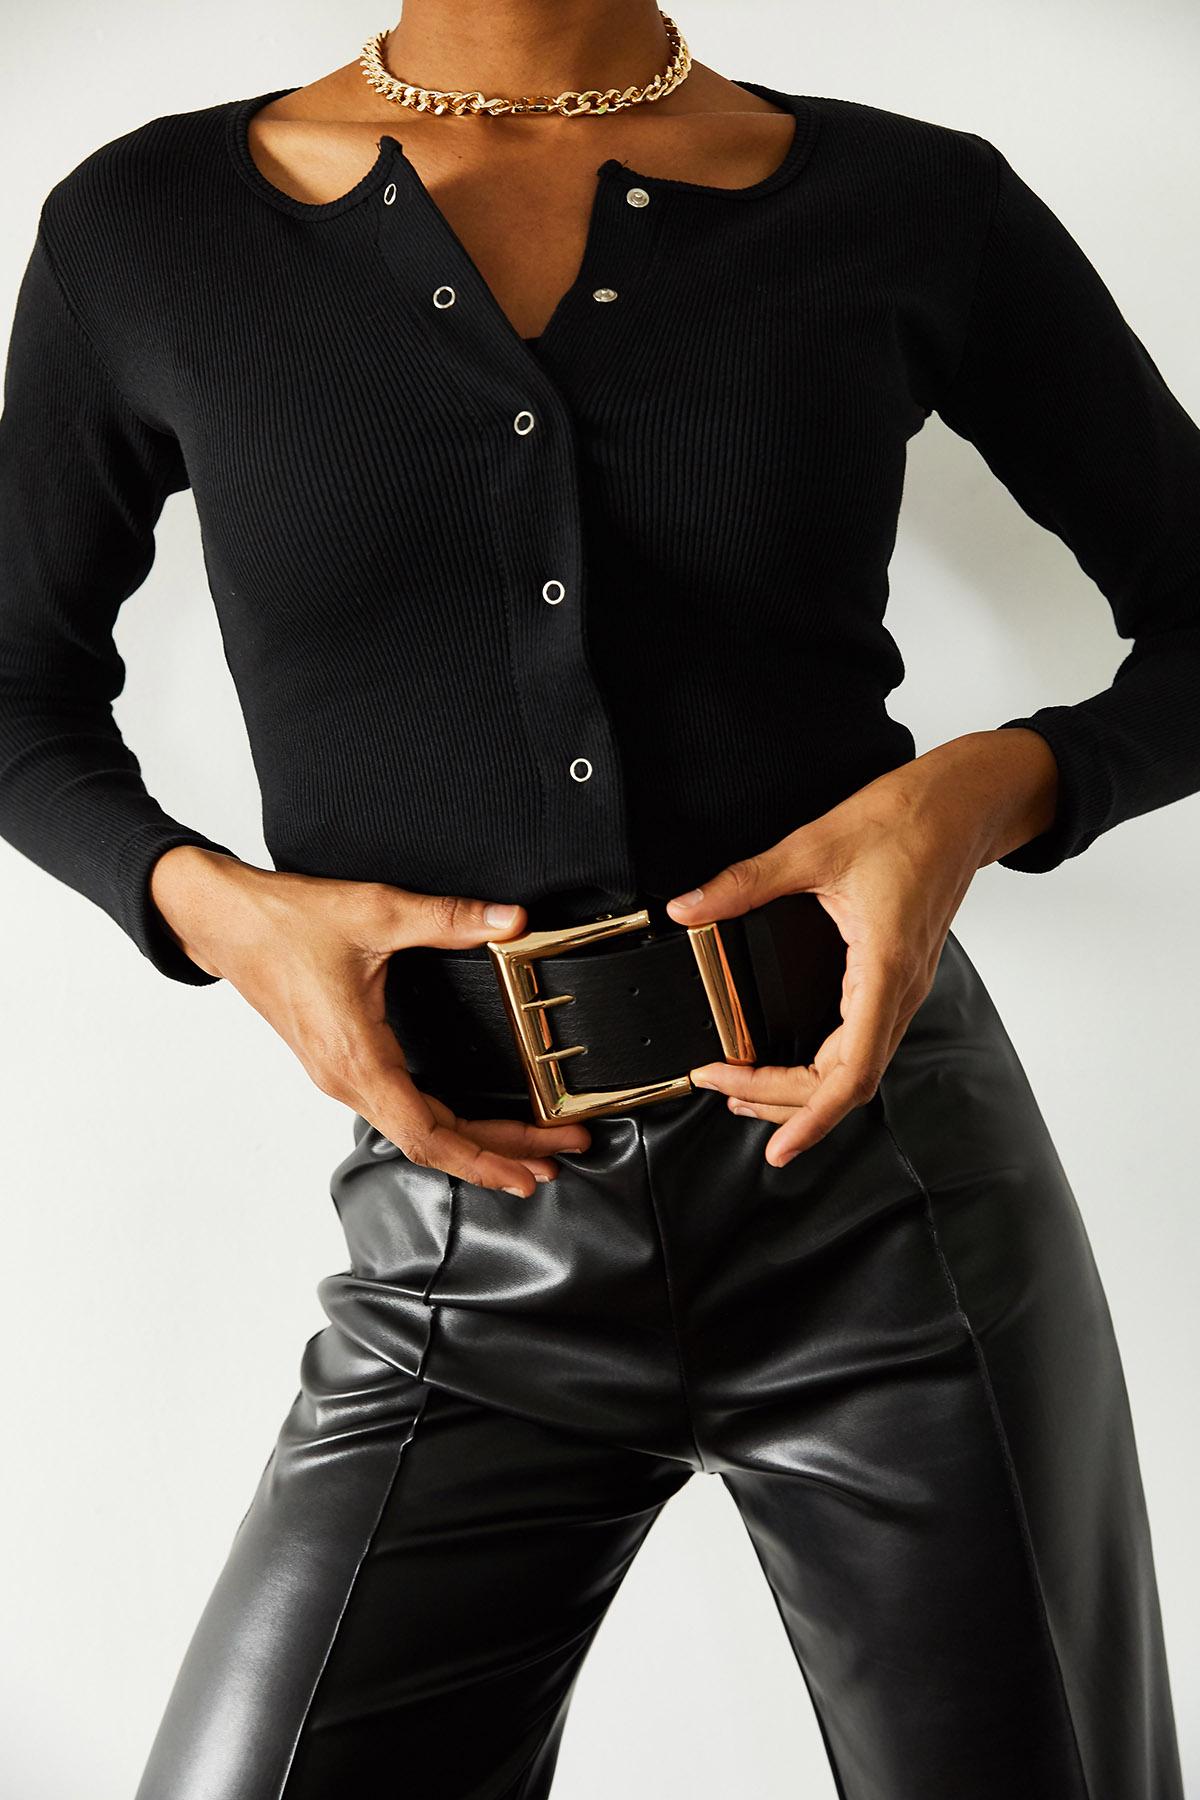 XHAN - Siyah Çıtçıtlı Bluz 1KXK3-44694-02